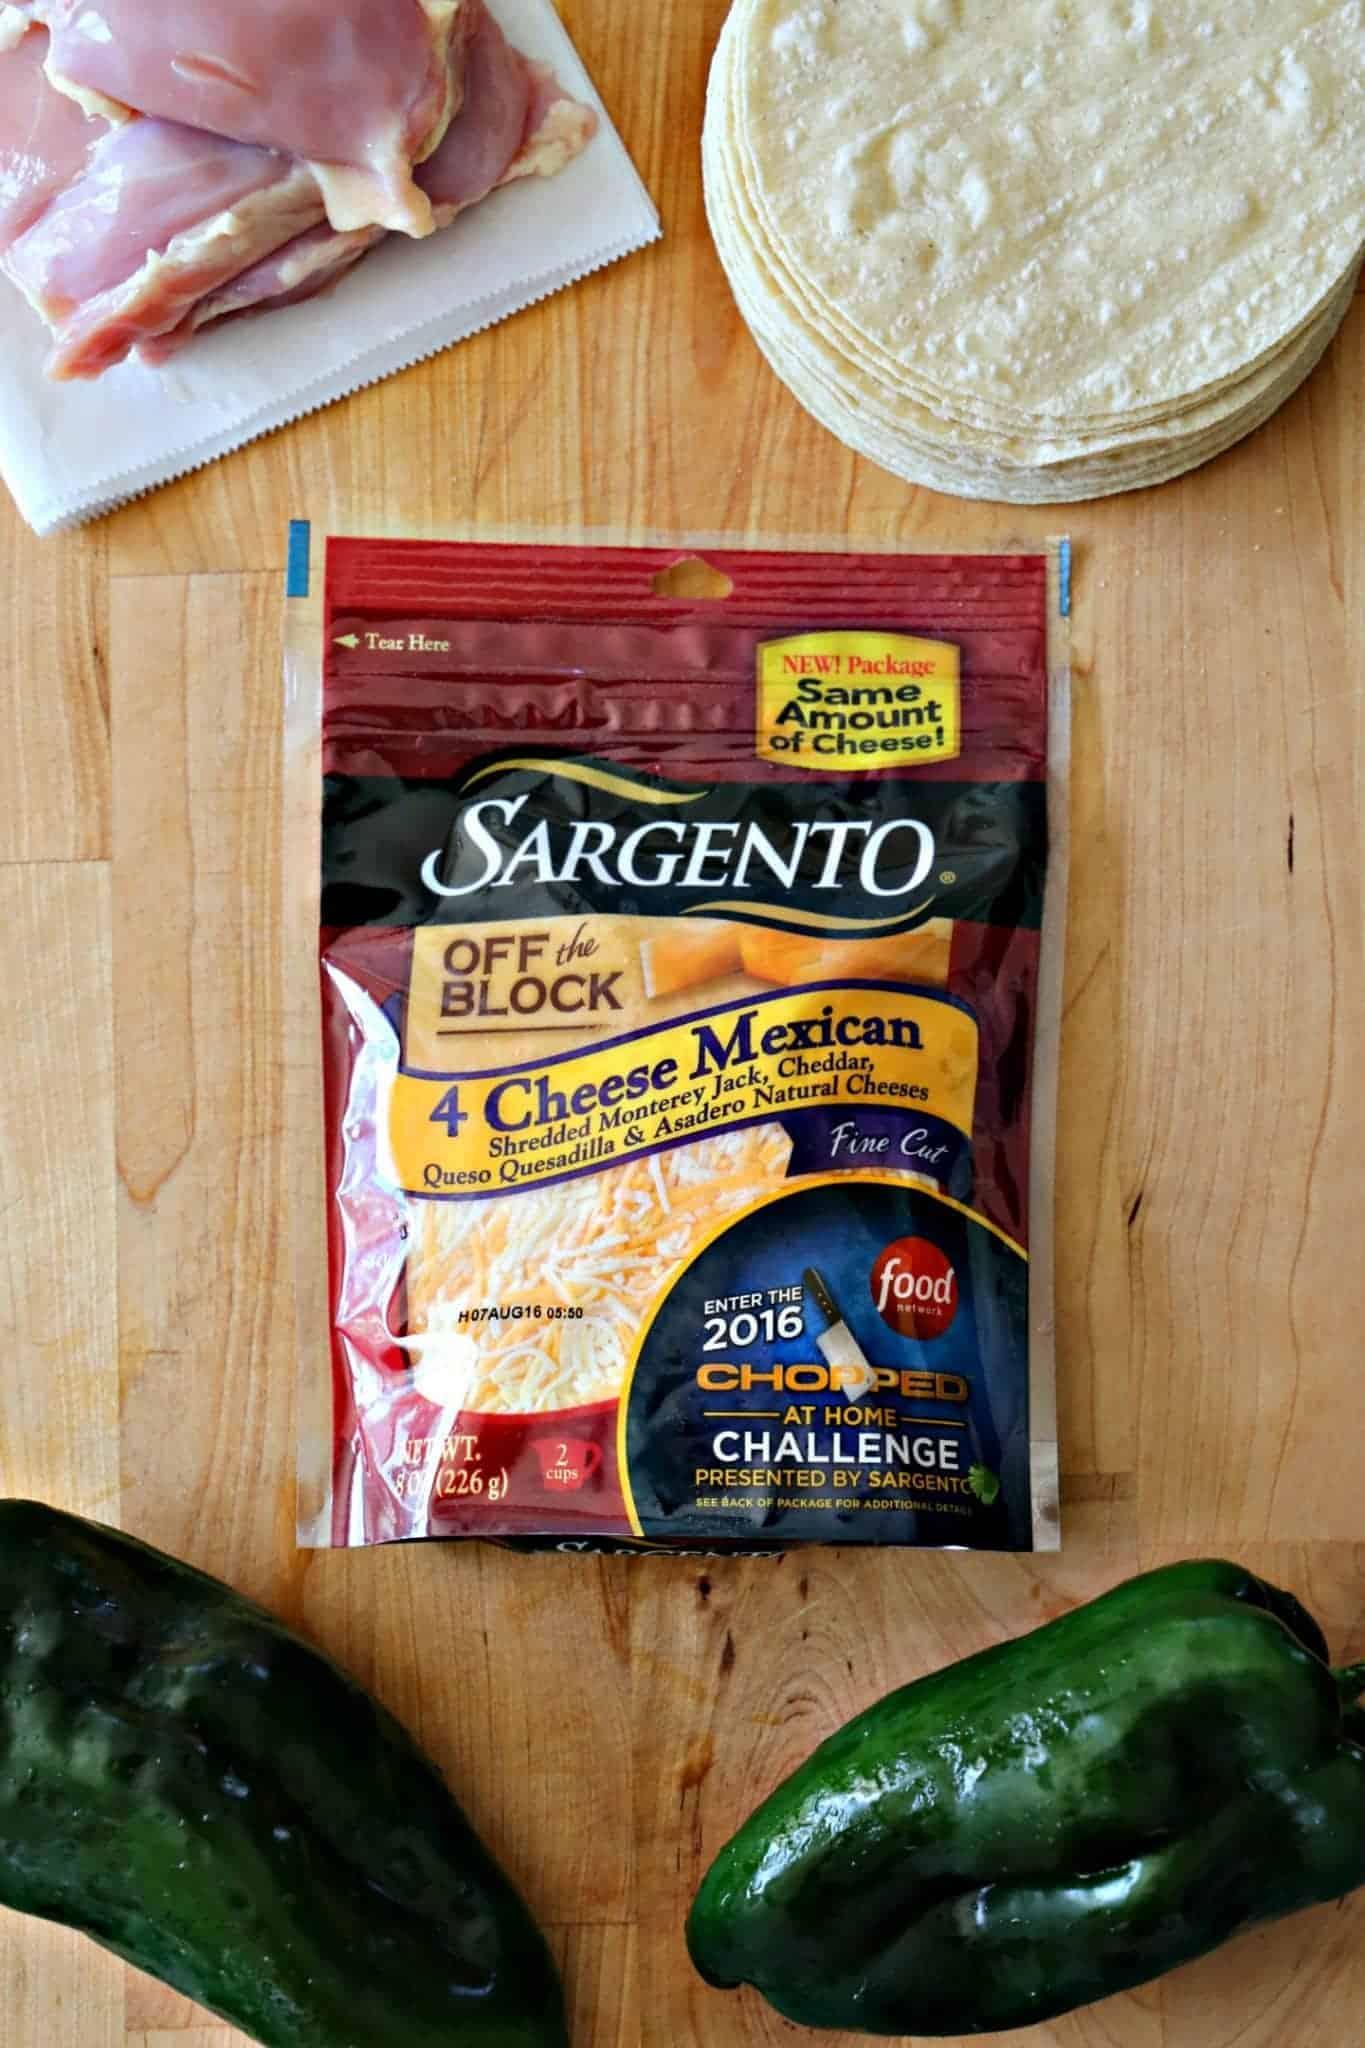 Sargento 4 Cheese Mexican